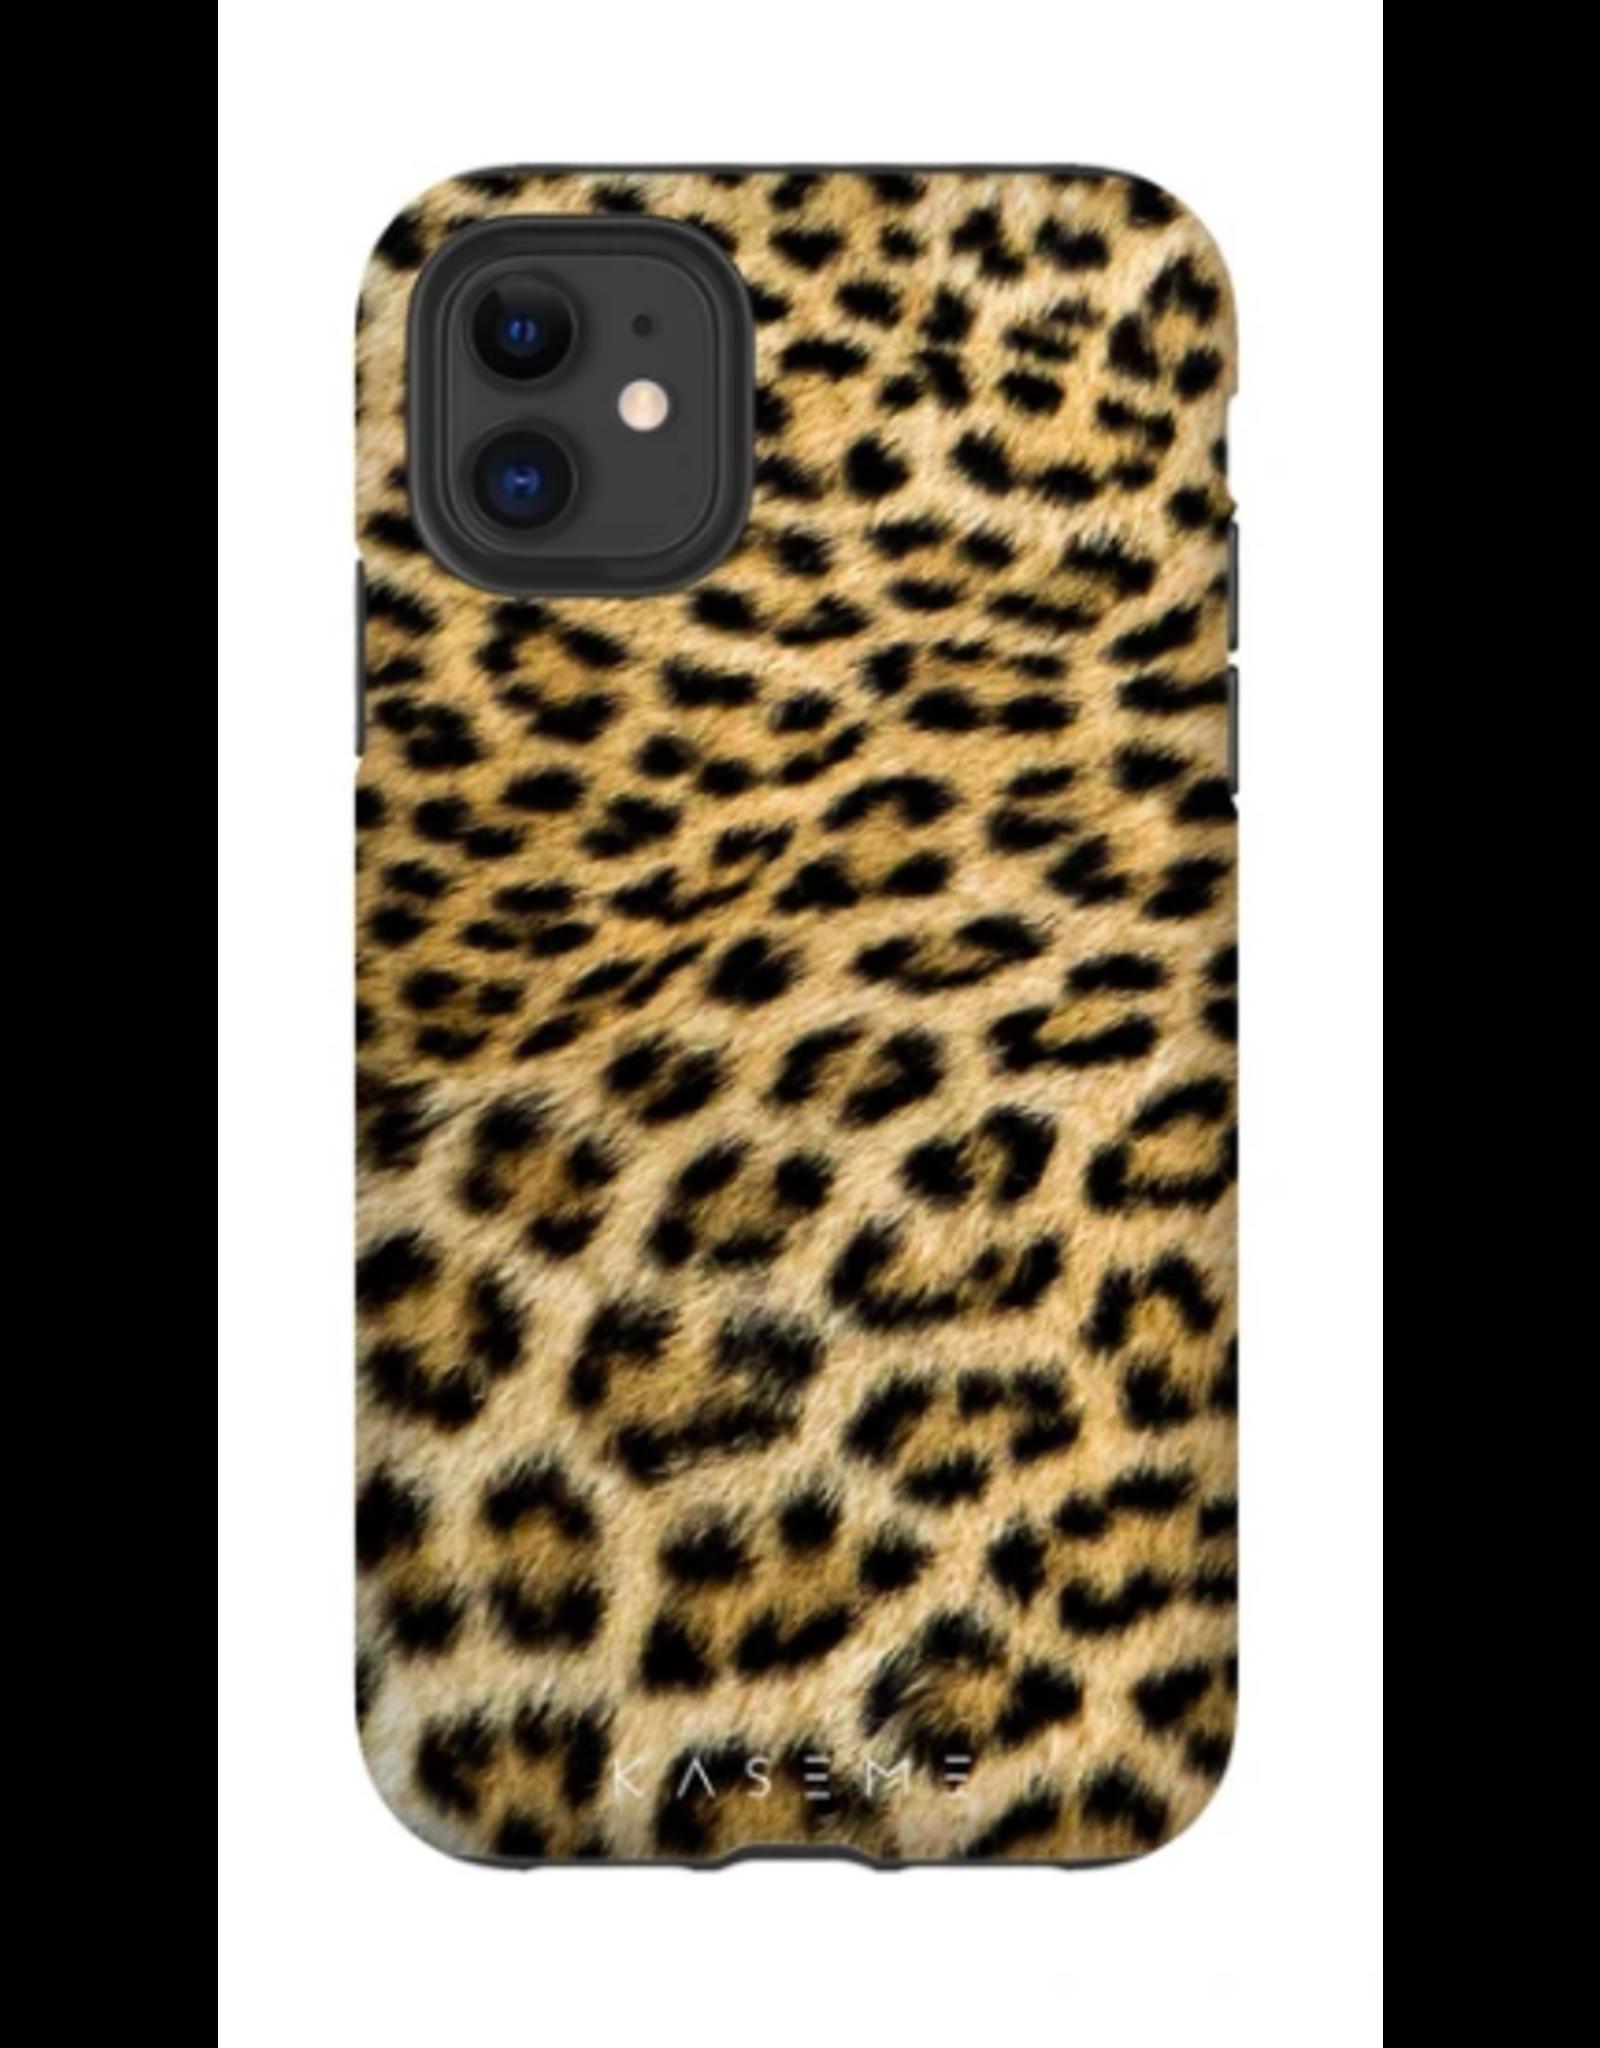 Kaseme Kaseme - Etui cellulaire IPhone leo